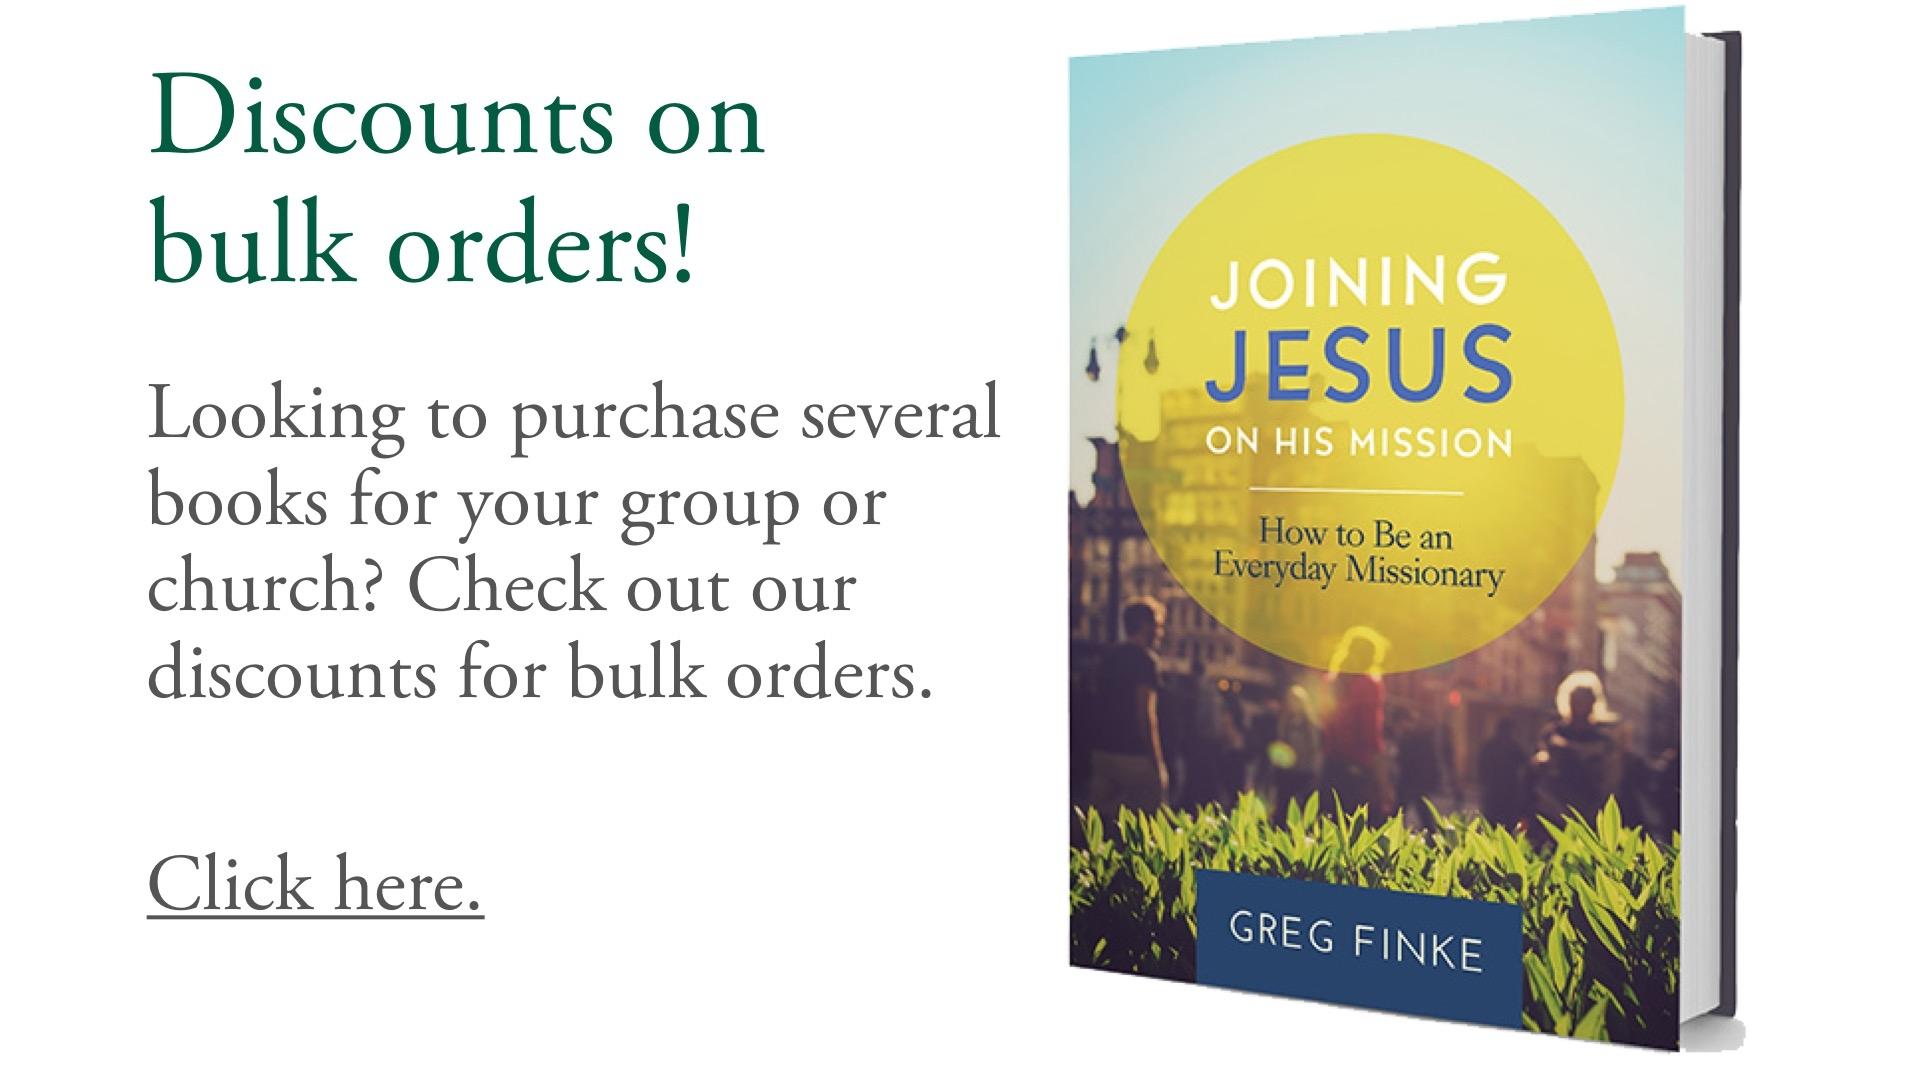 Discounts on bulk orders!